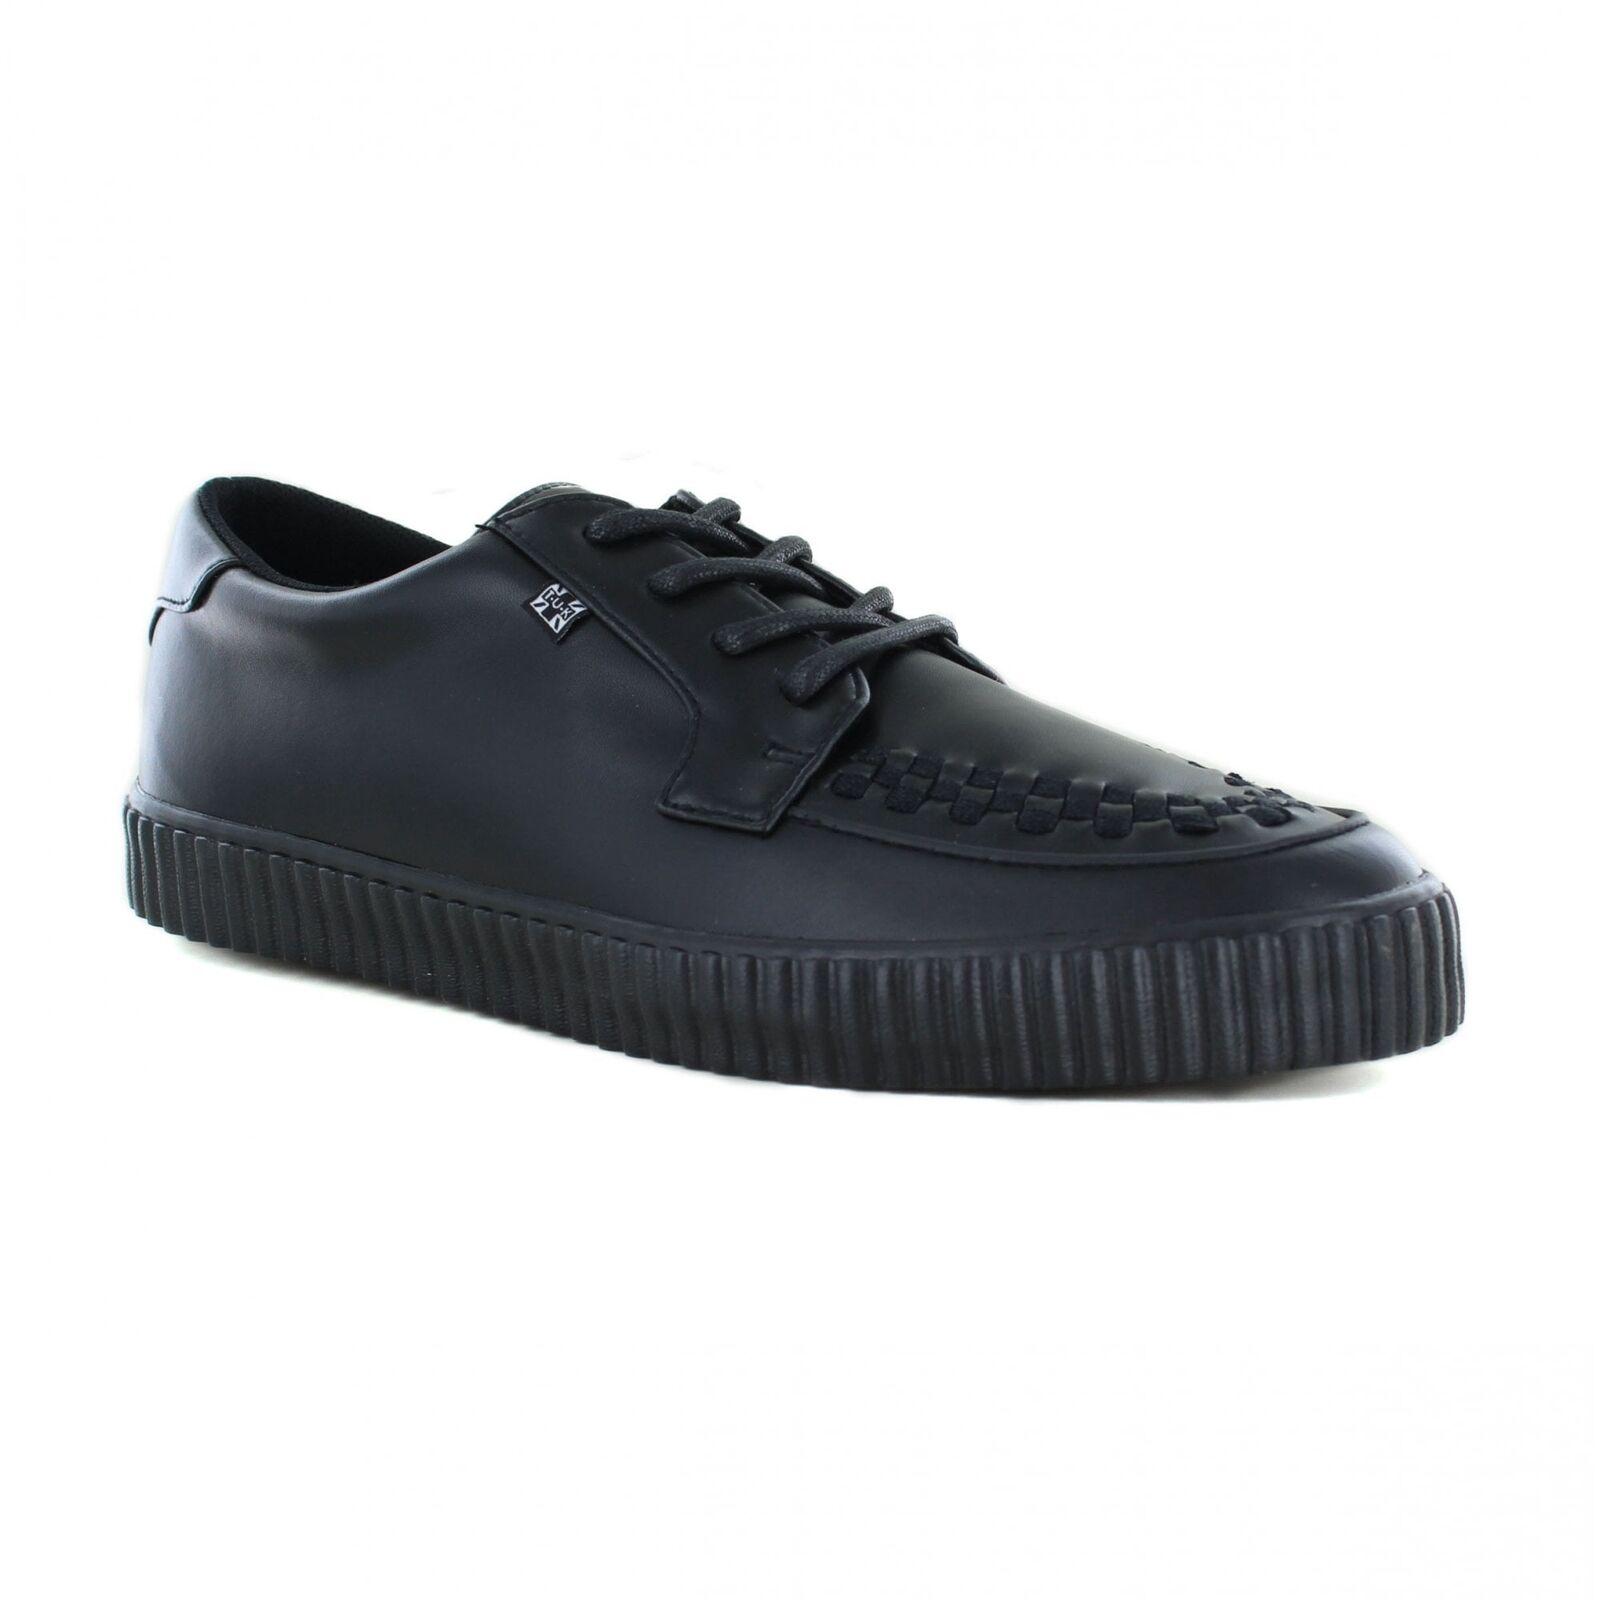 Tuk A9366 Unisex Vegano EZC ENREDADERA Zapatos-Negro